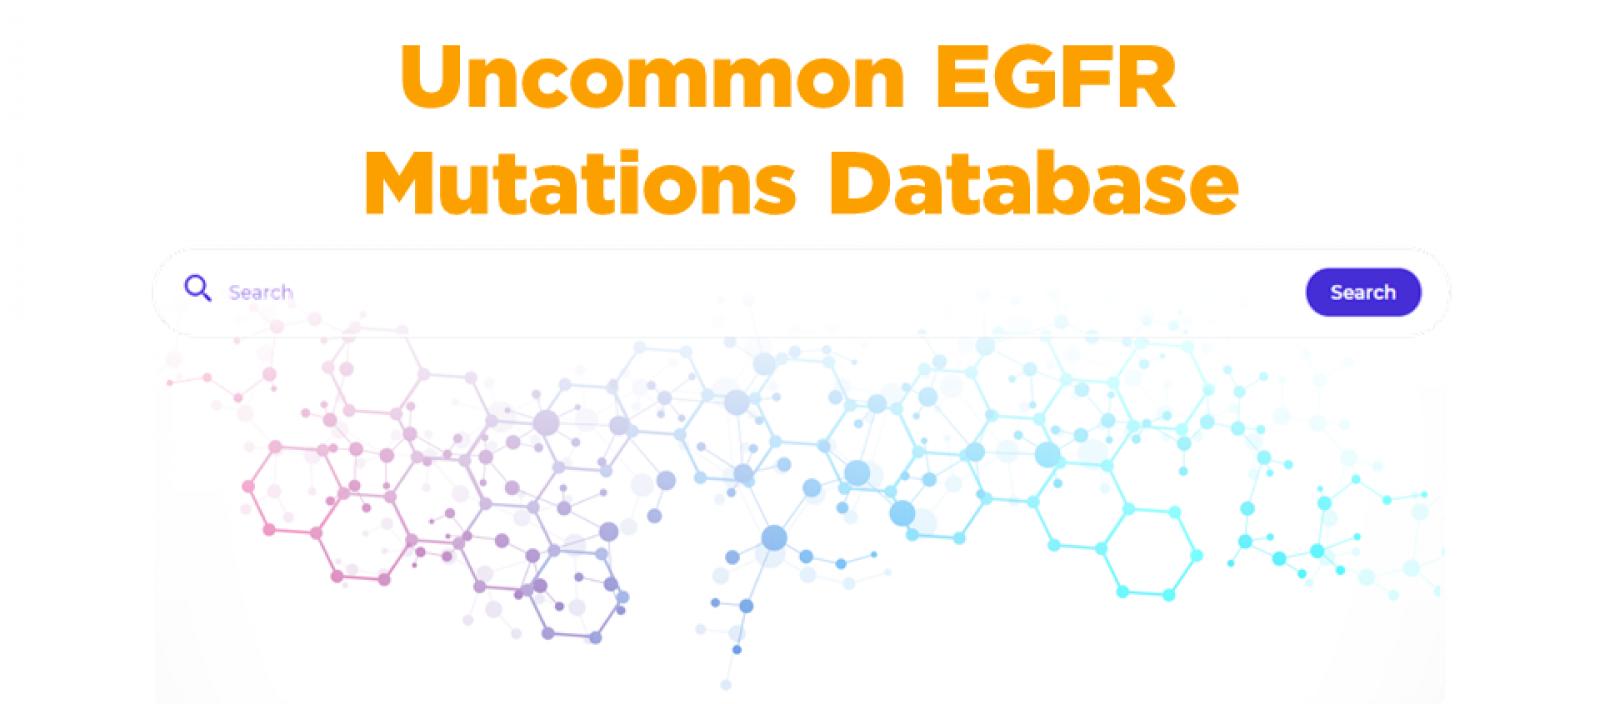 Uncommon EGFR mutations